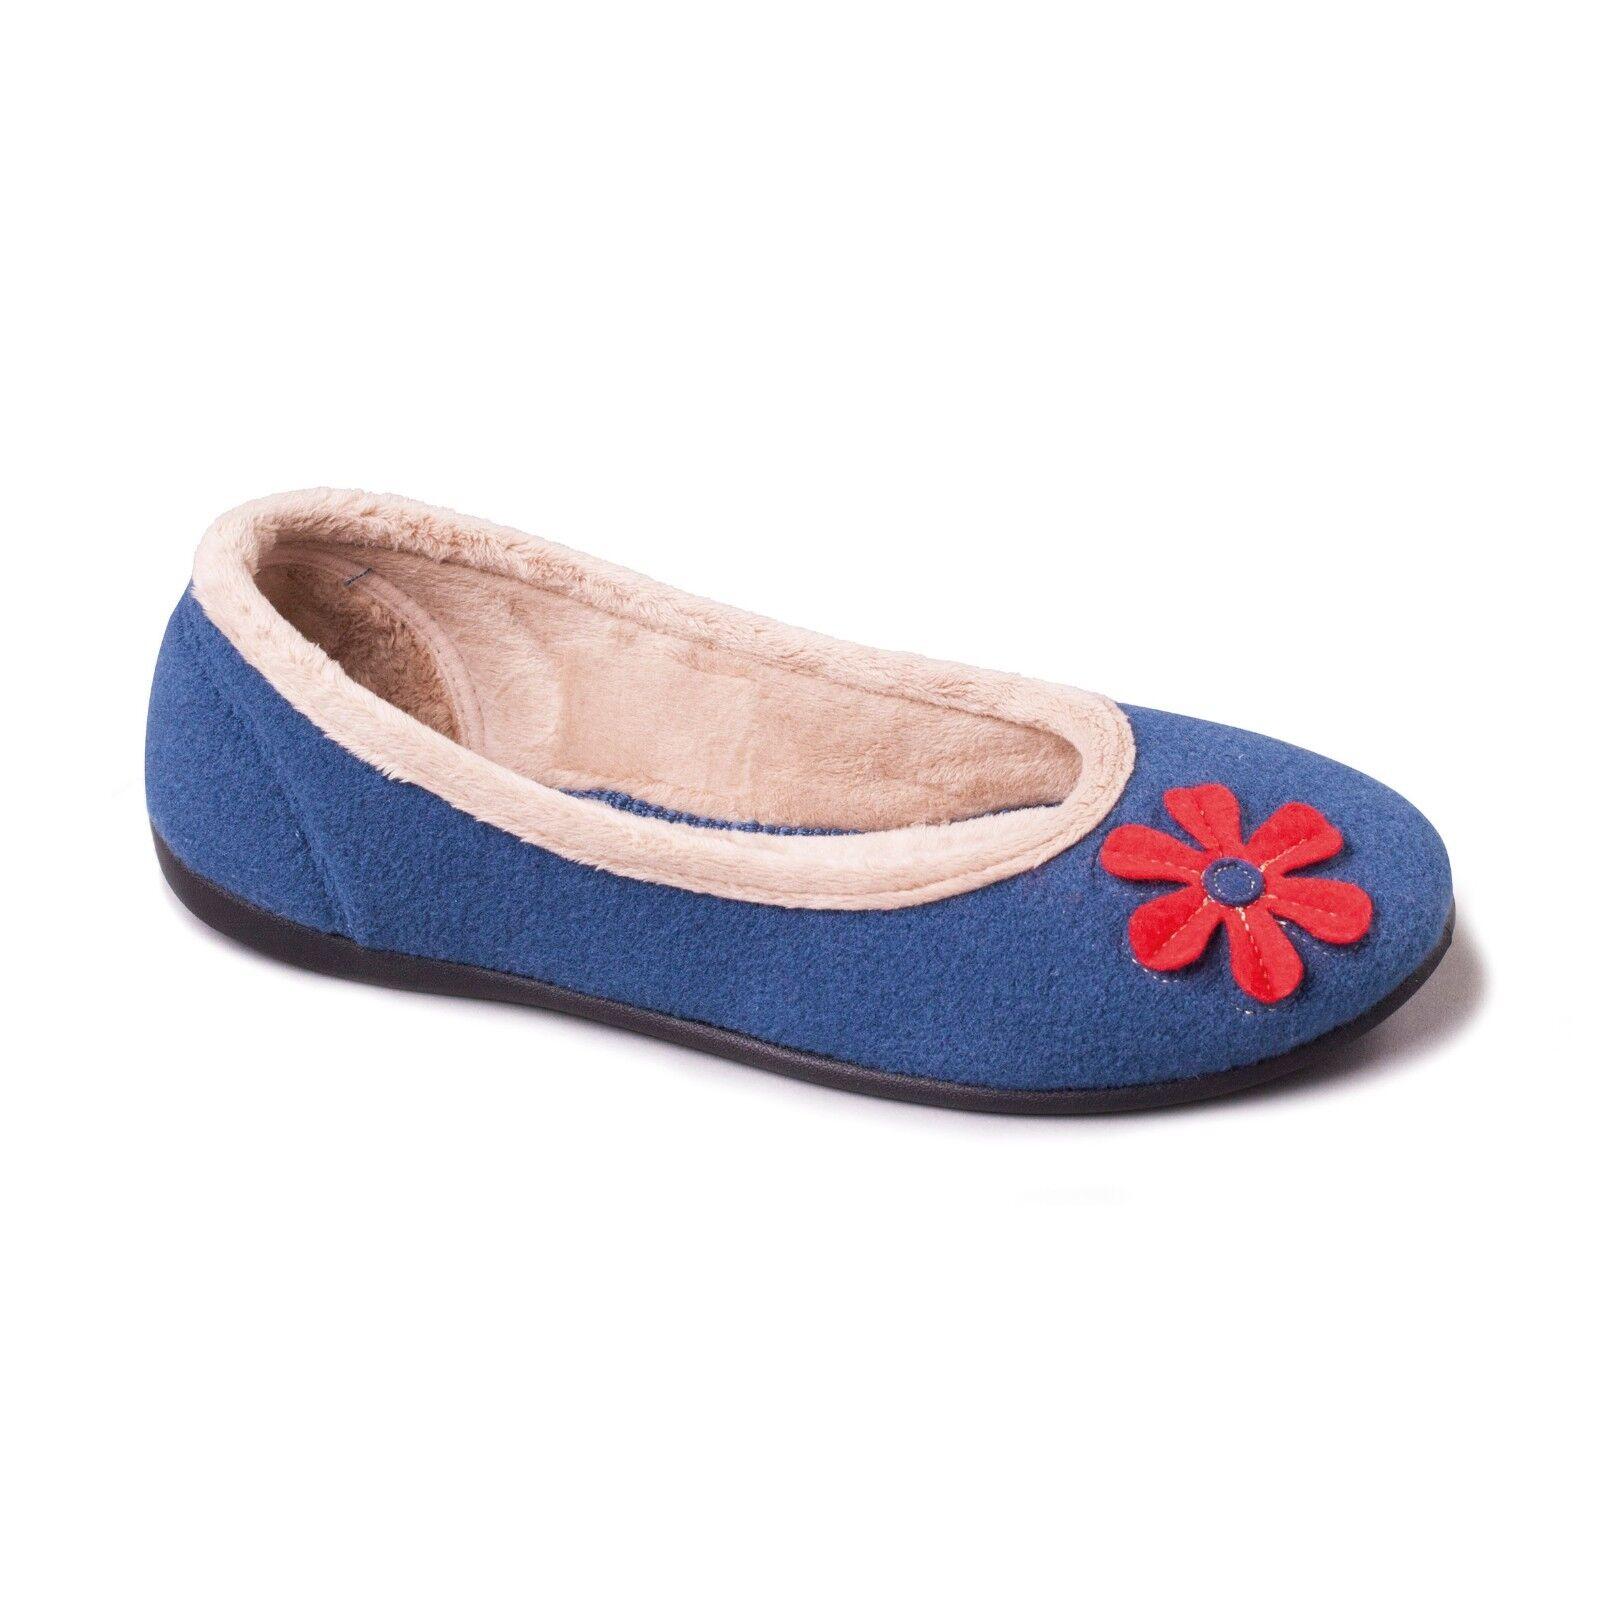 Padders HAPPY Ladies Ballerina Memory Foam Extra Wide E Fitting Slipper Blue